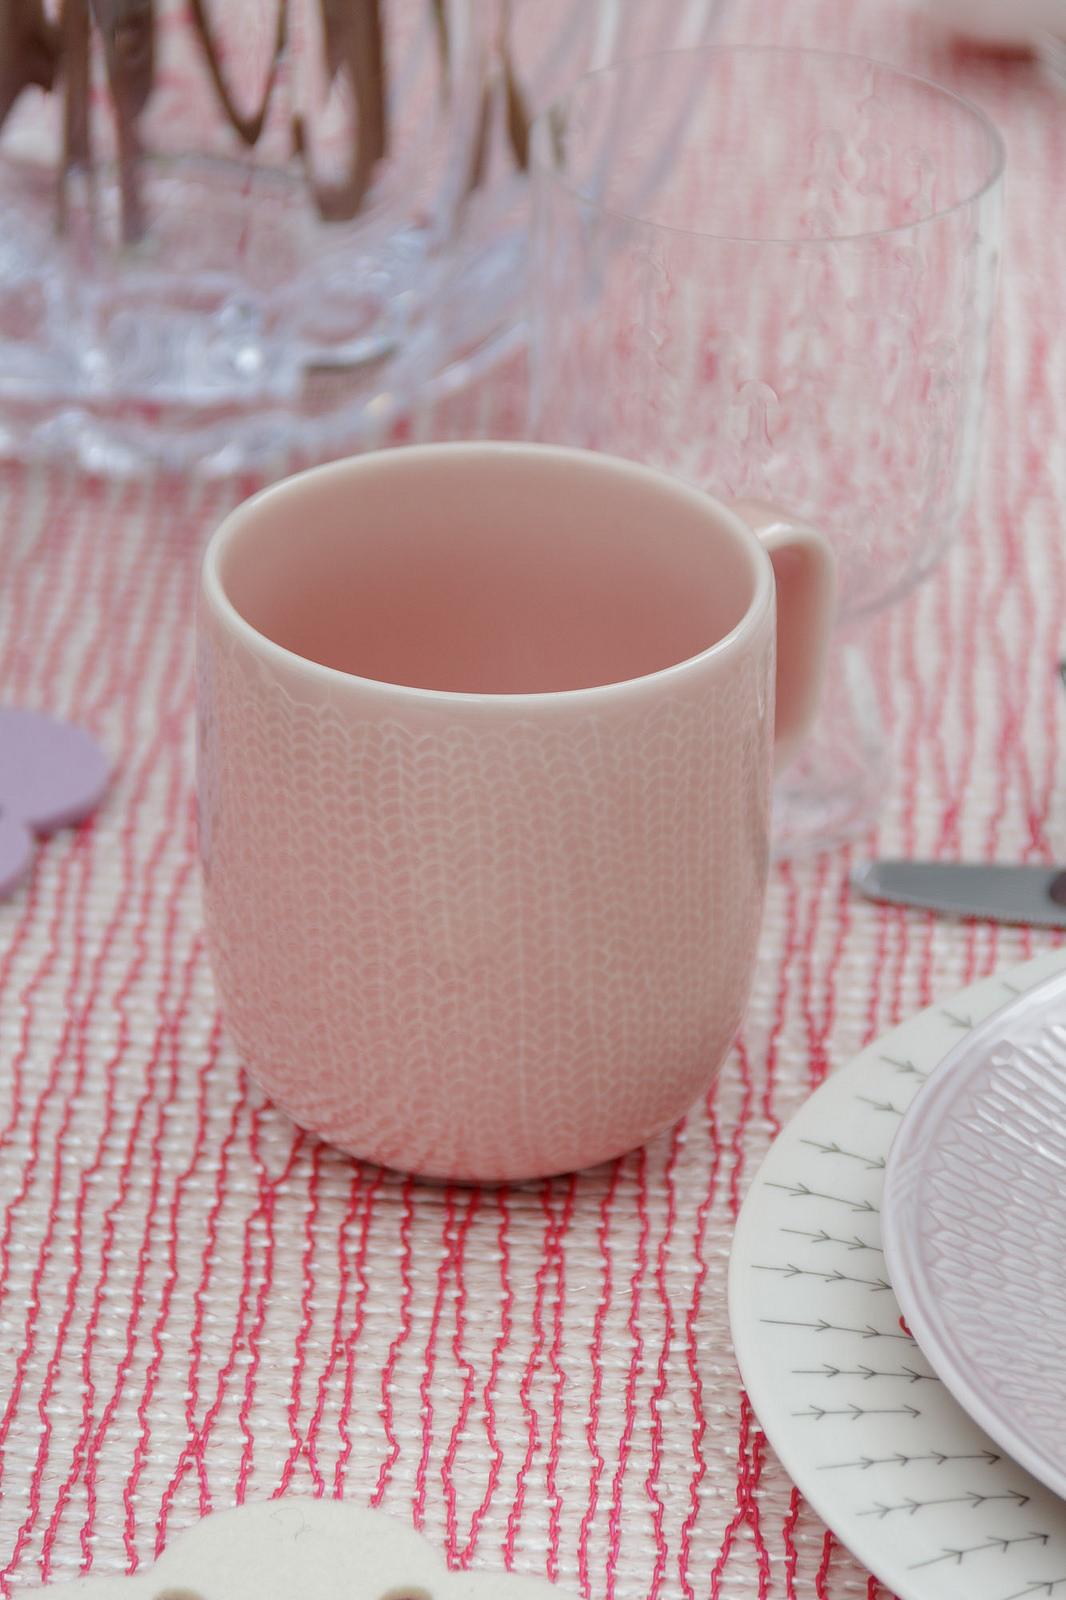 iittala Sarjaton mug and glass